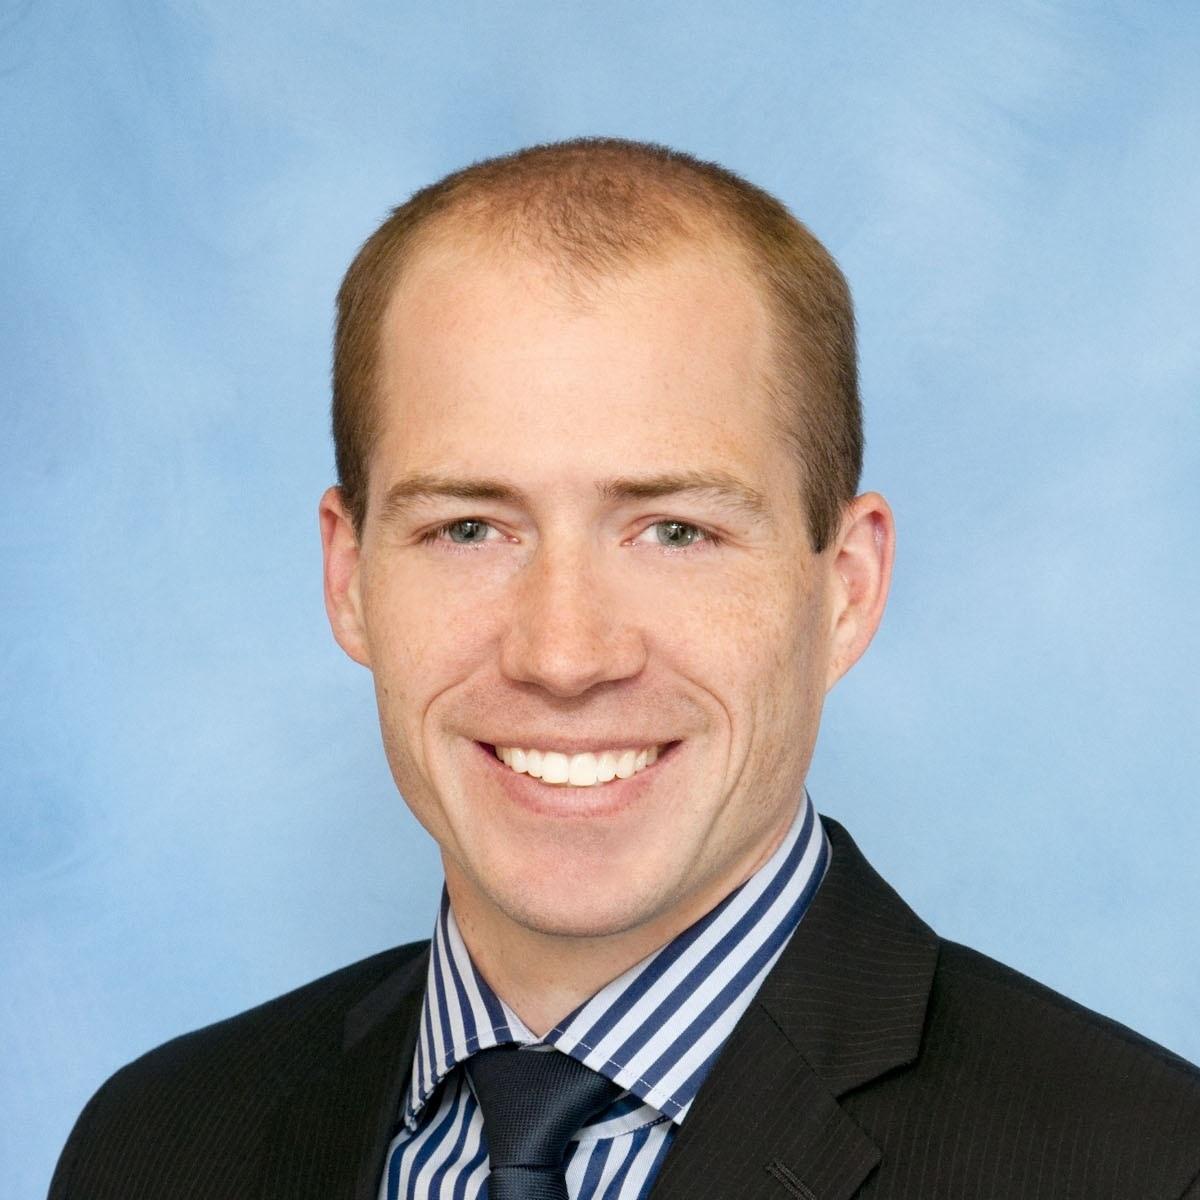 Pediatric Surgical Associates Welcomes Joshua Short, MD/PhD